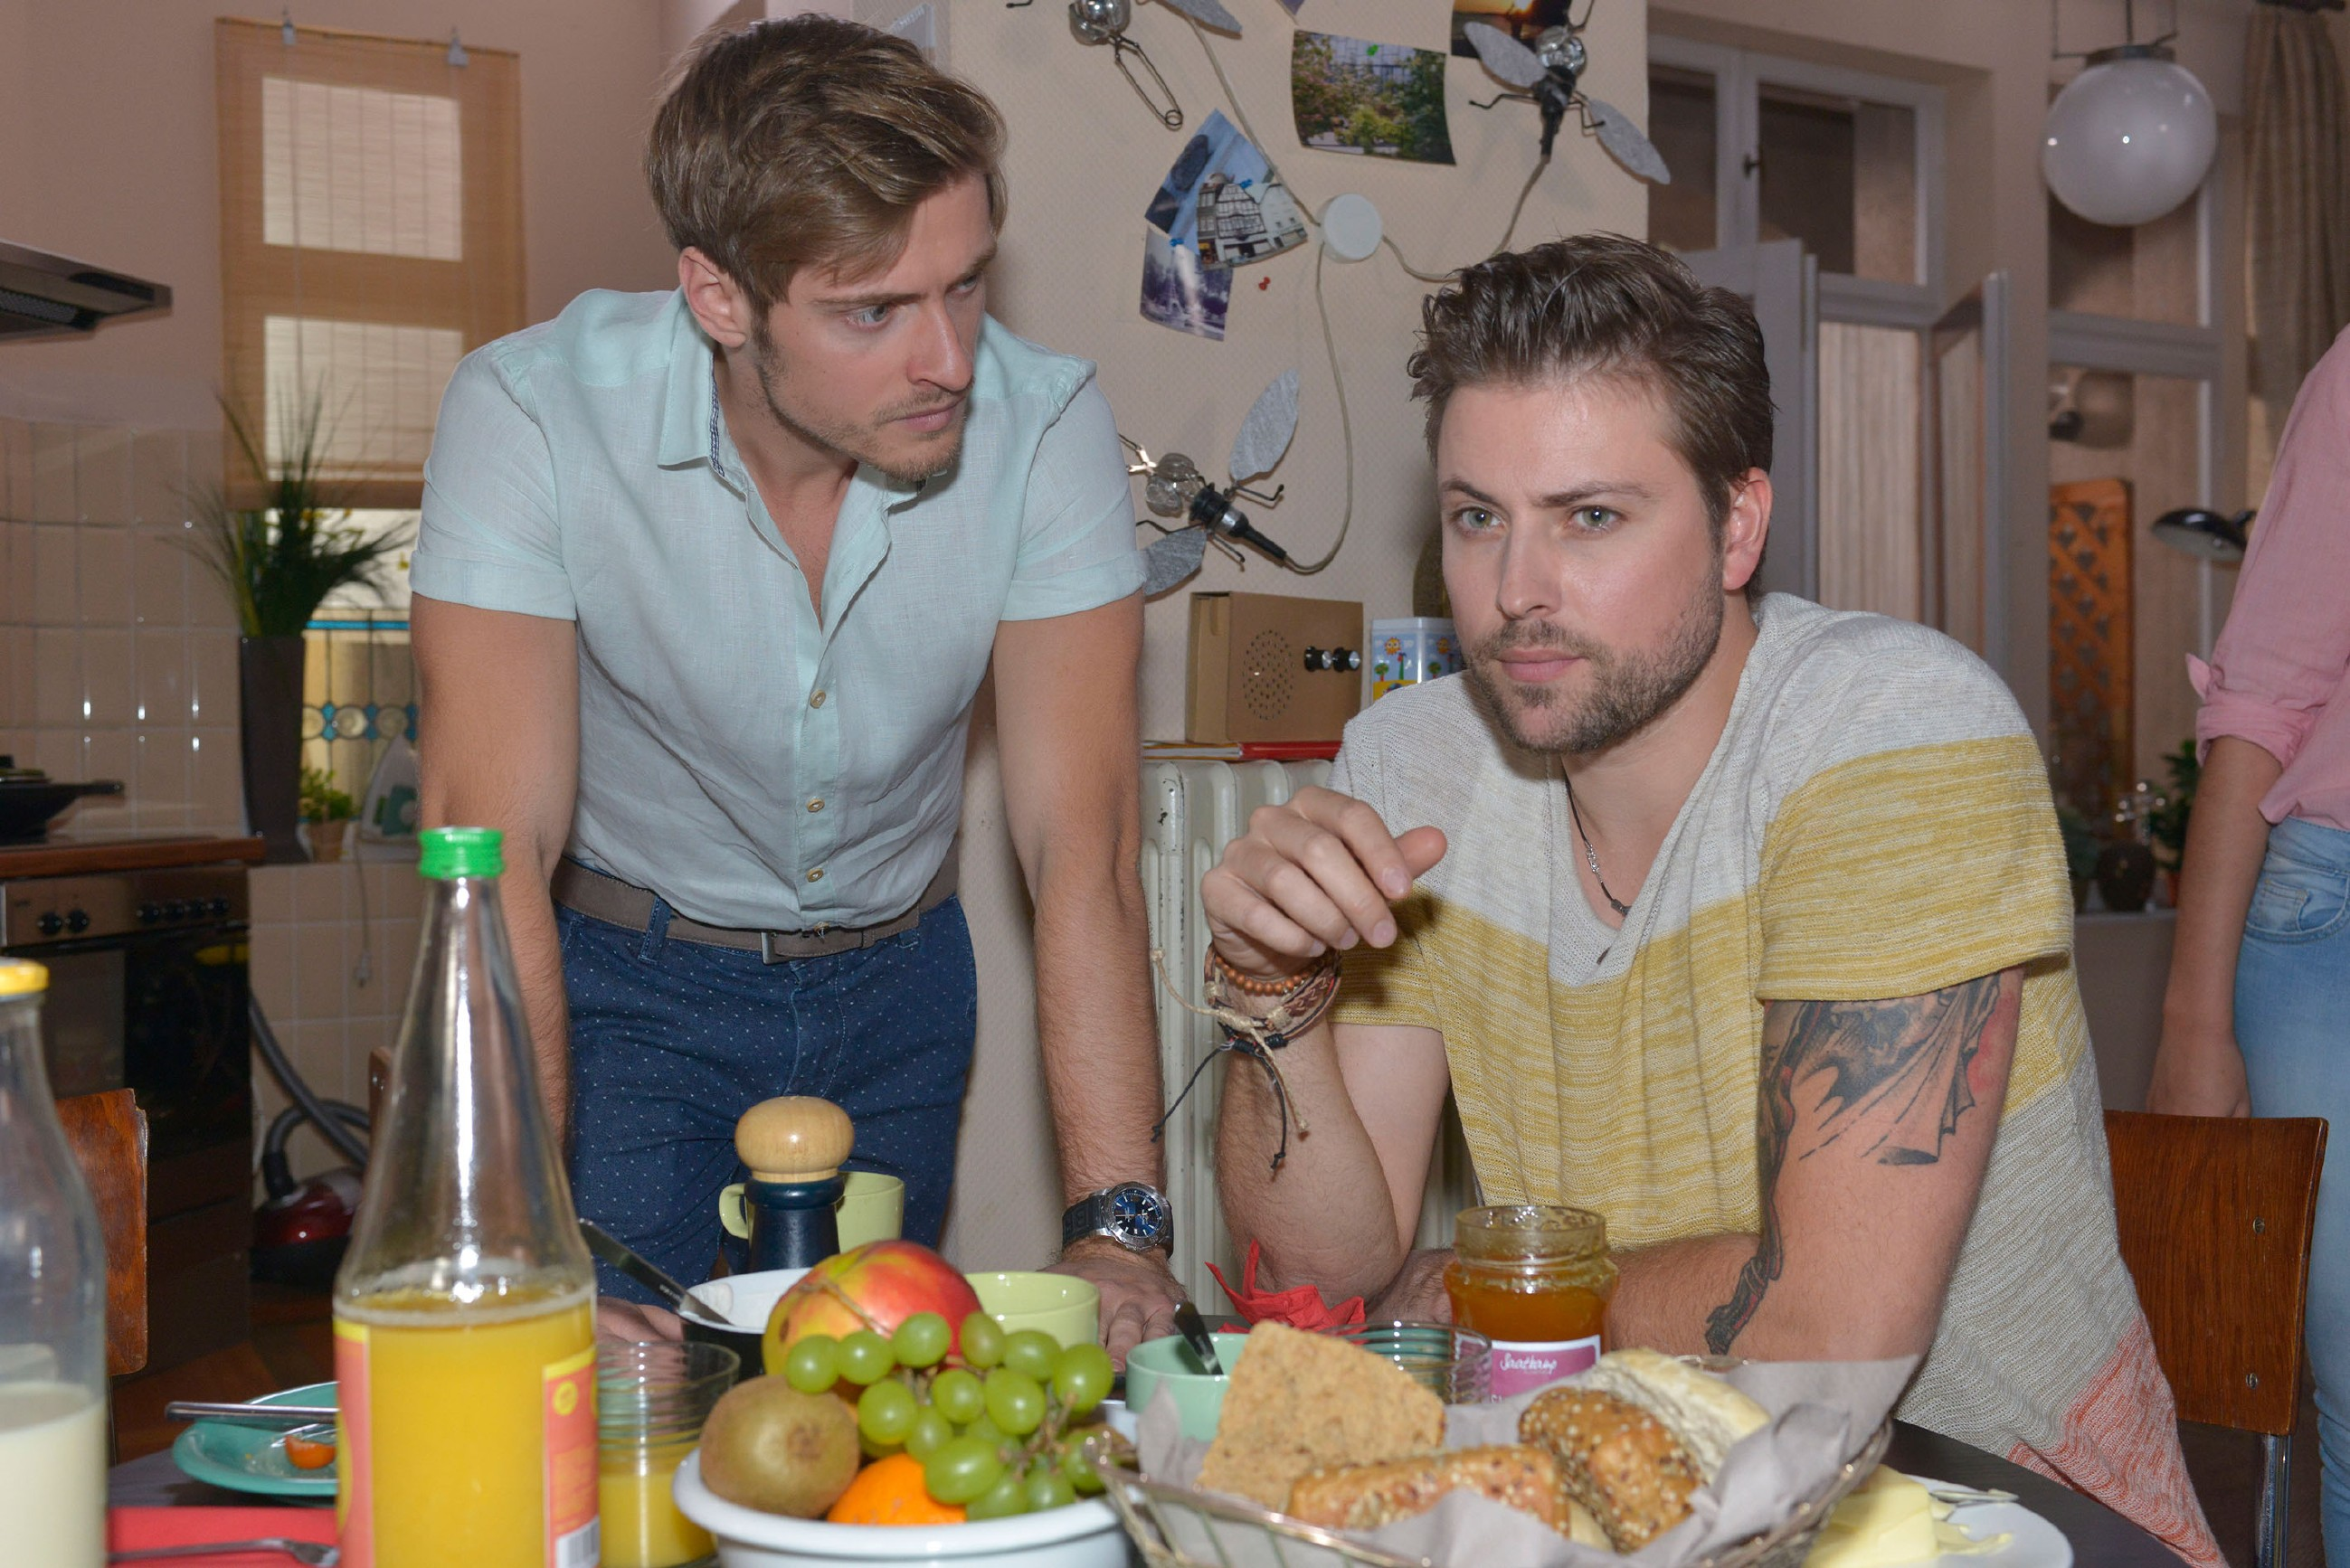 Philip (Jörn Schlönvoigt, l.) geht John (Felix von Jascheroff) wegen Elena eifersüchtig an. (Quelle: © RTL / Rolf Baumgartner)